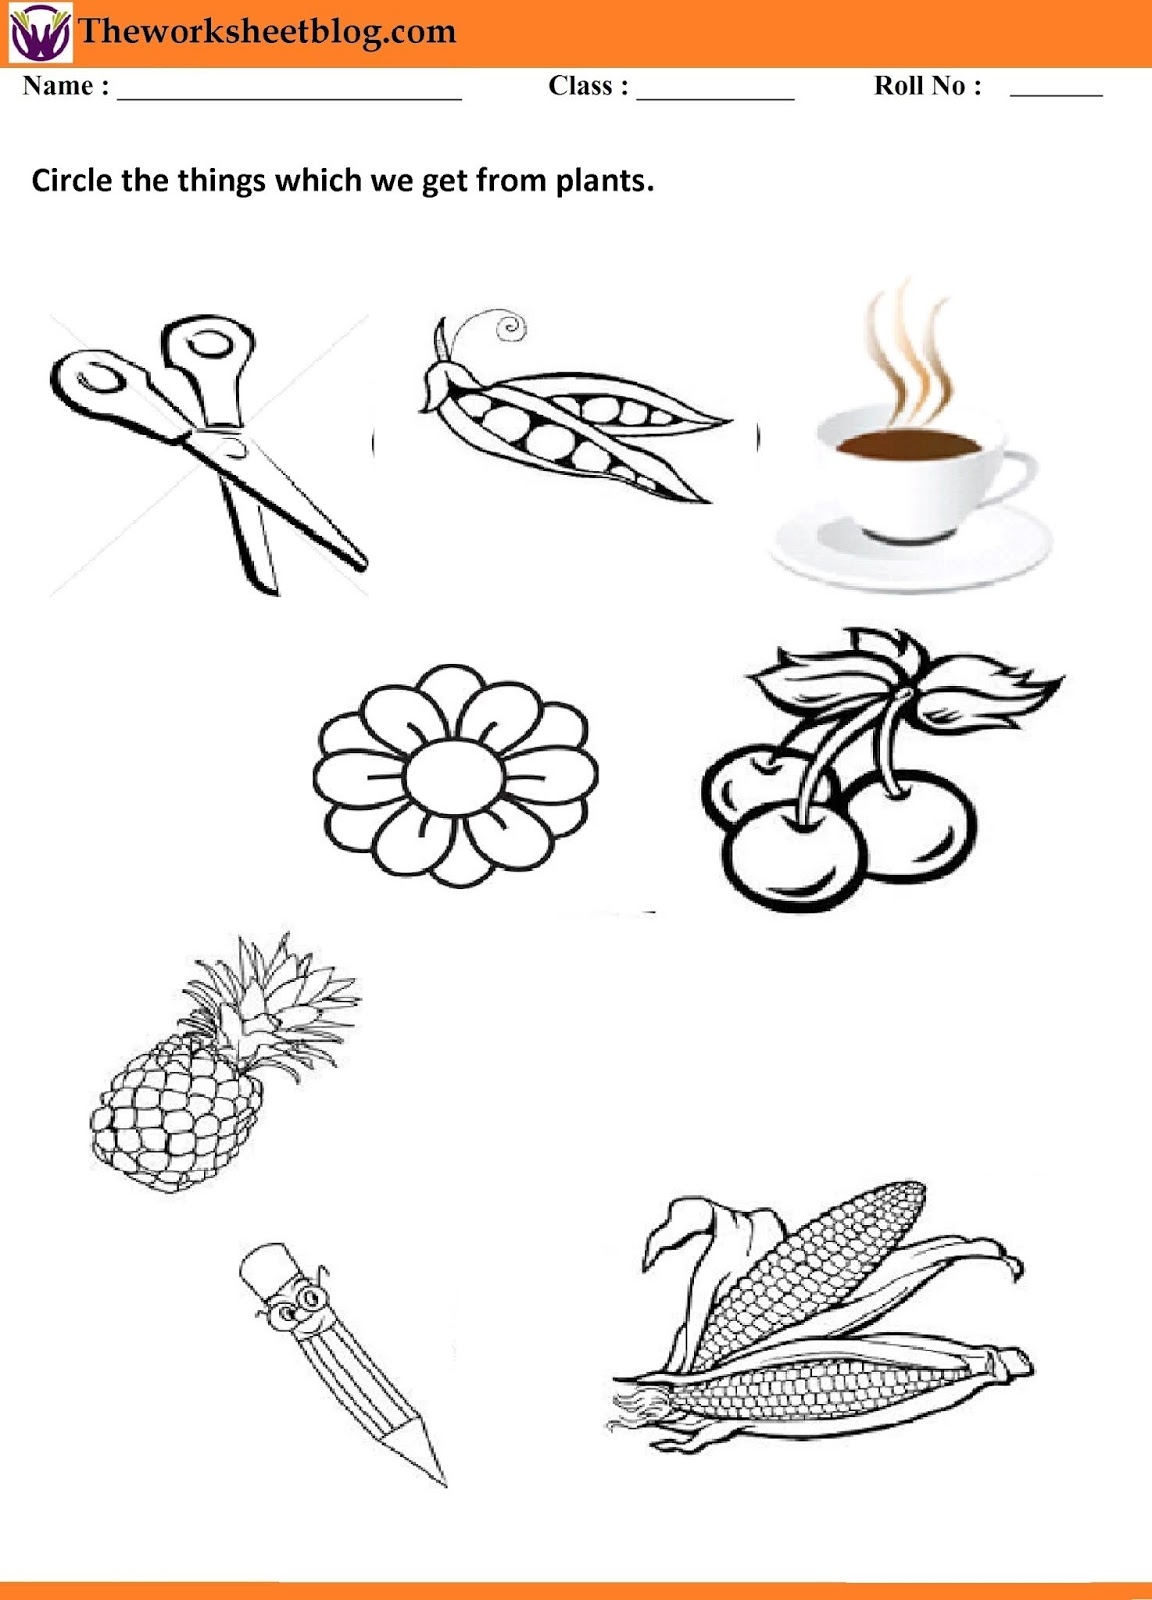 hight resolution of Plants around us worksheets - Theworksheetsblog